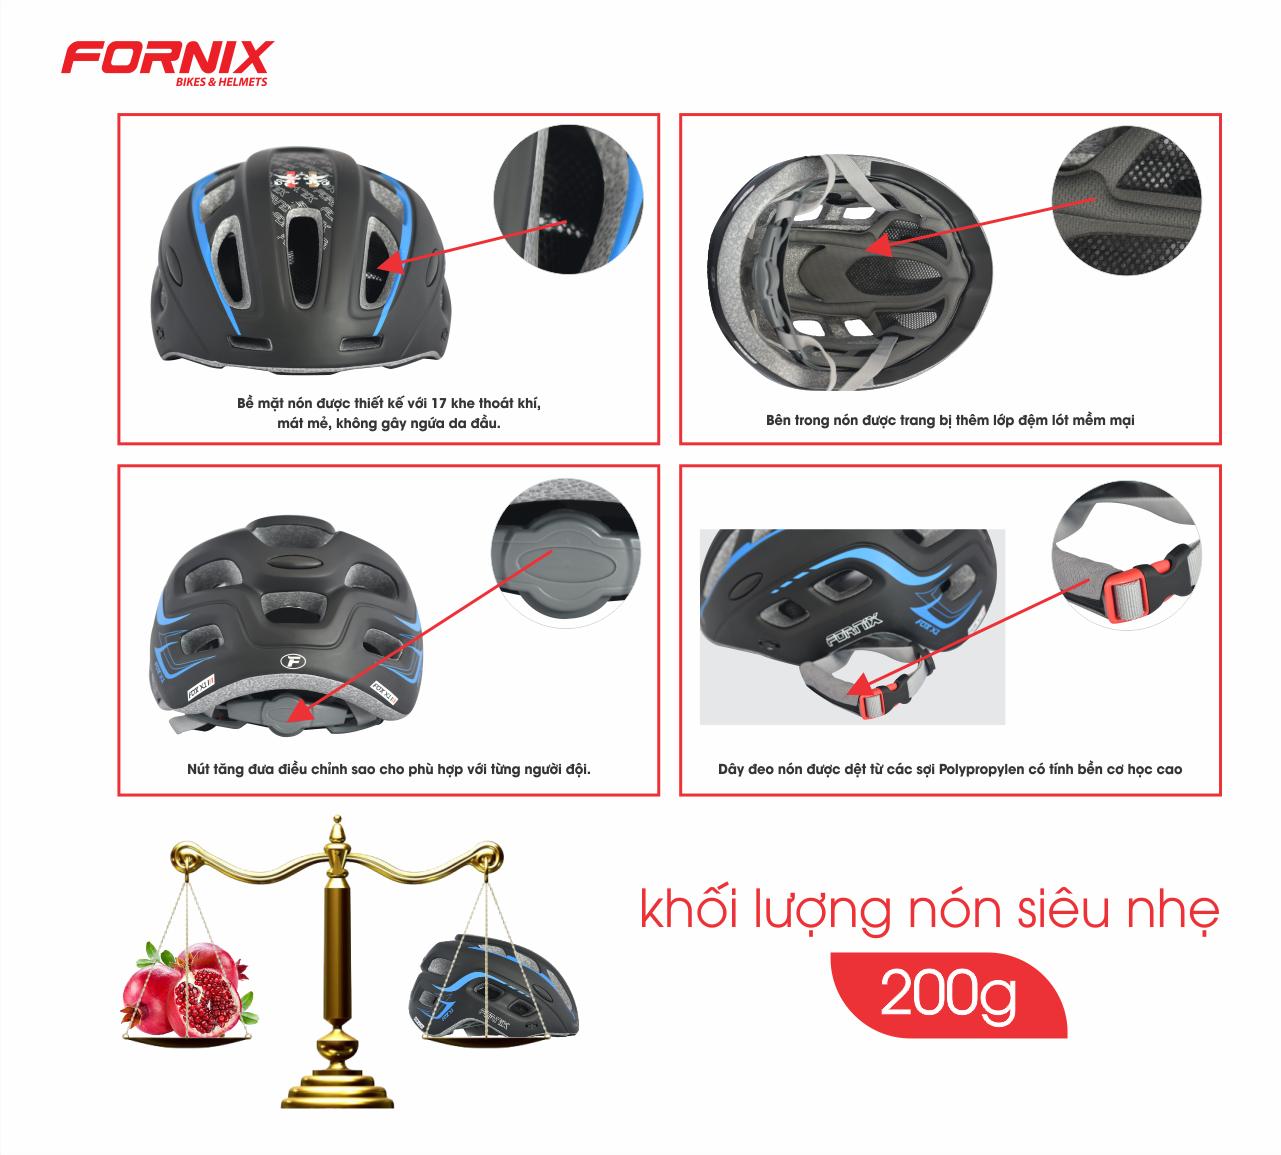 NÓN BẢO HIỂM FORNIX A02NM38